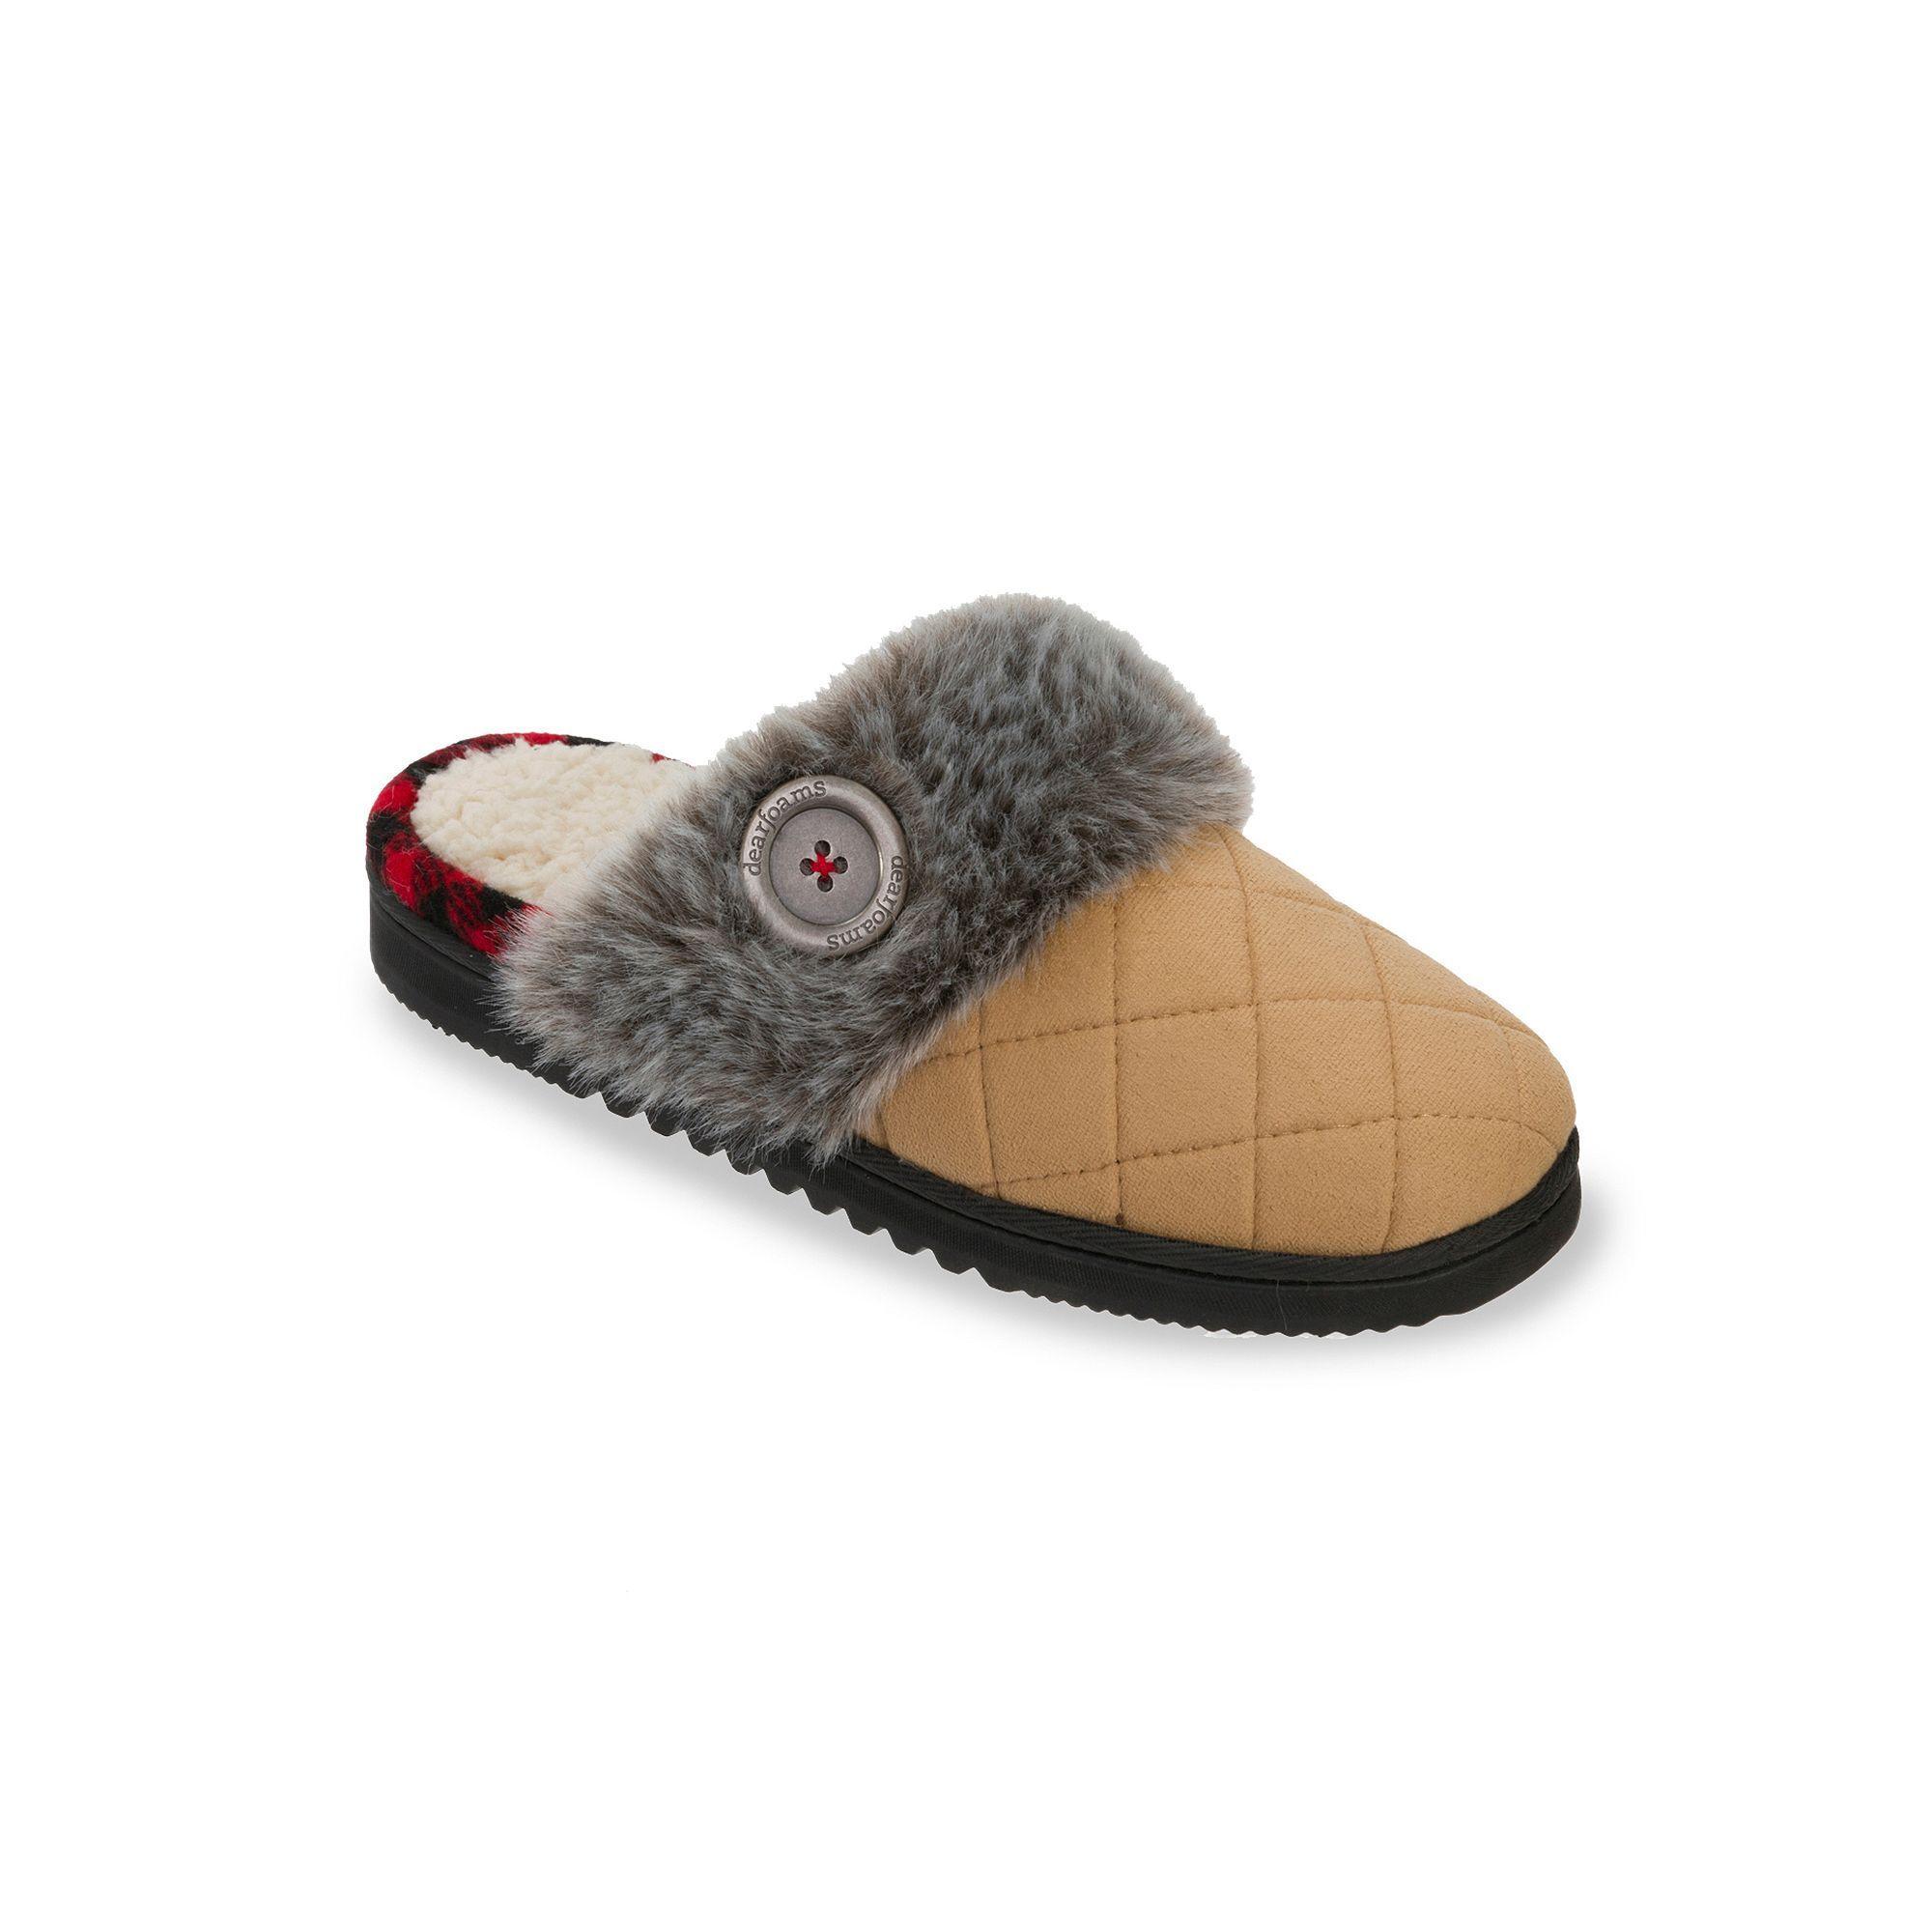 Dearfoams Women's Chalet Quilted Scuff Memory Foam Clog Slippers, Size:  Medium, Beige Oth